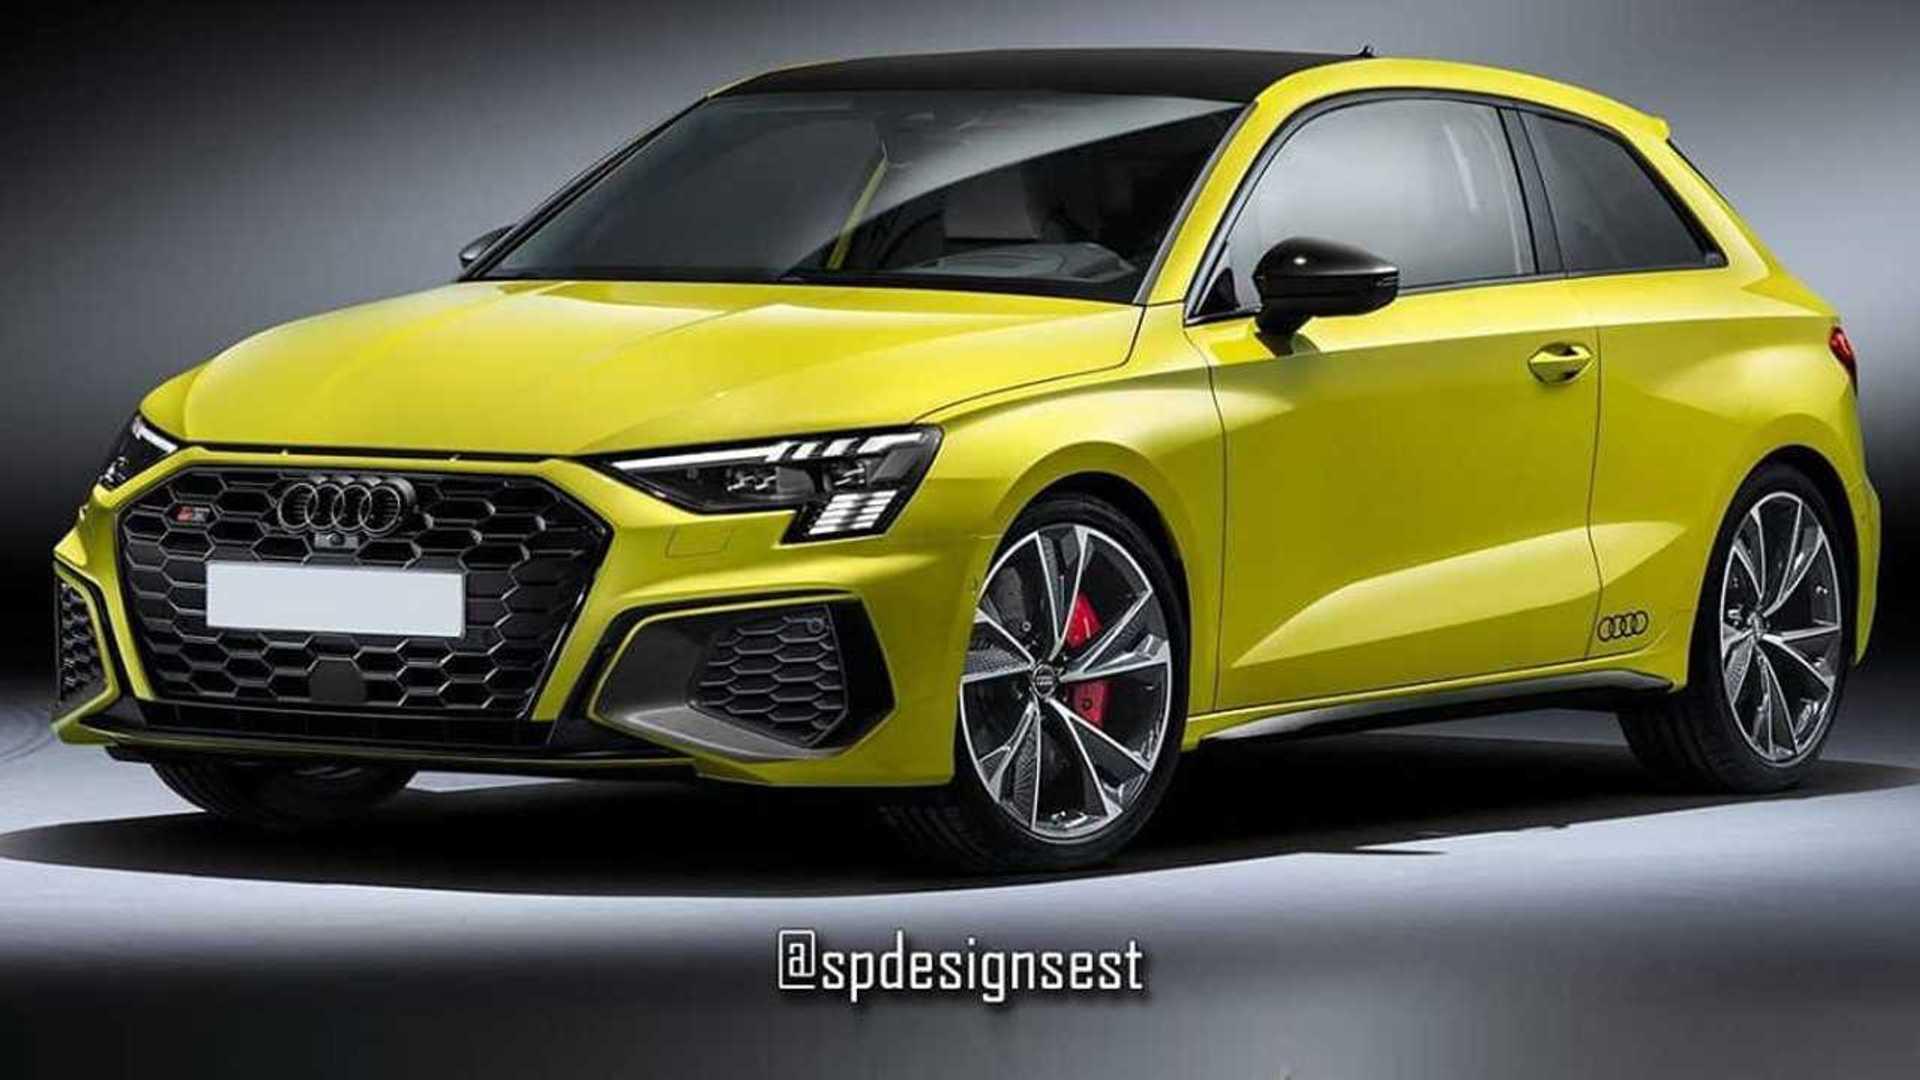 2021-audi-s3-three-door-hatchback-renderings.jpg